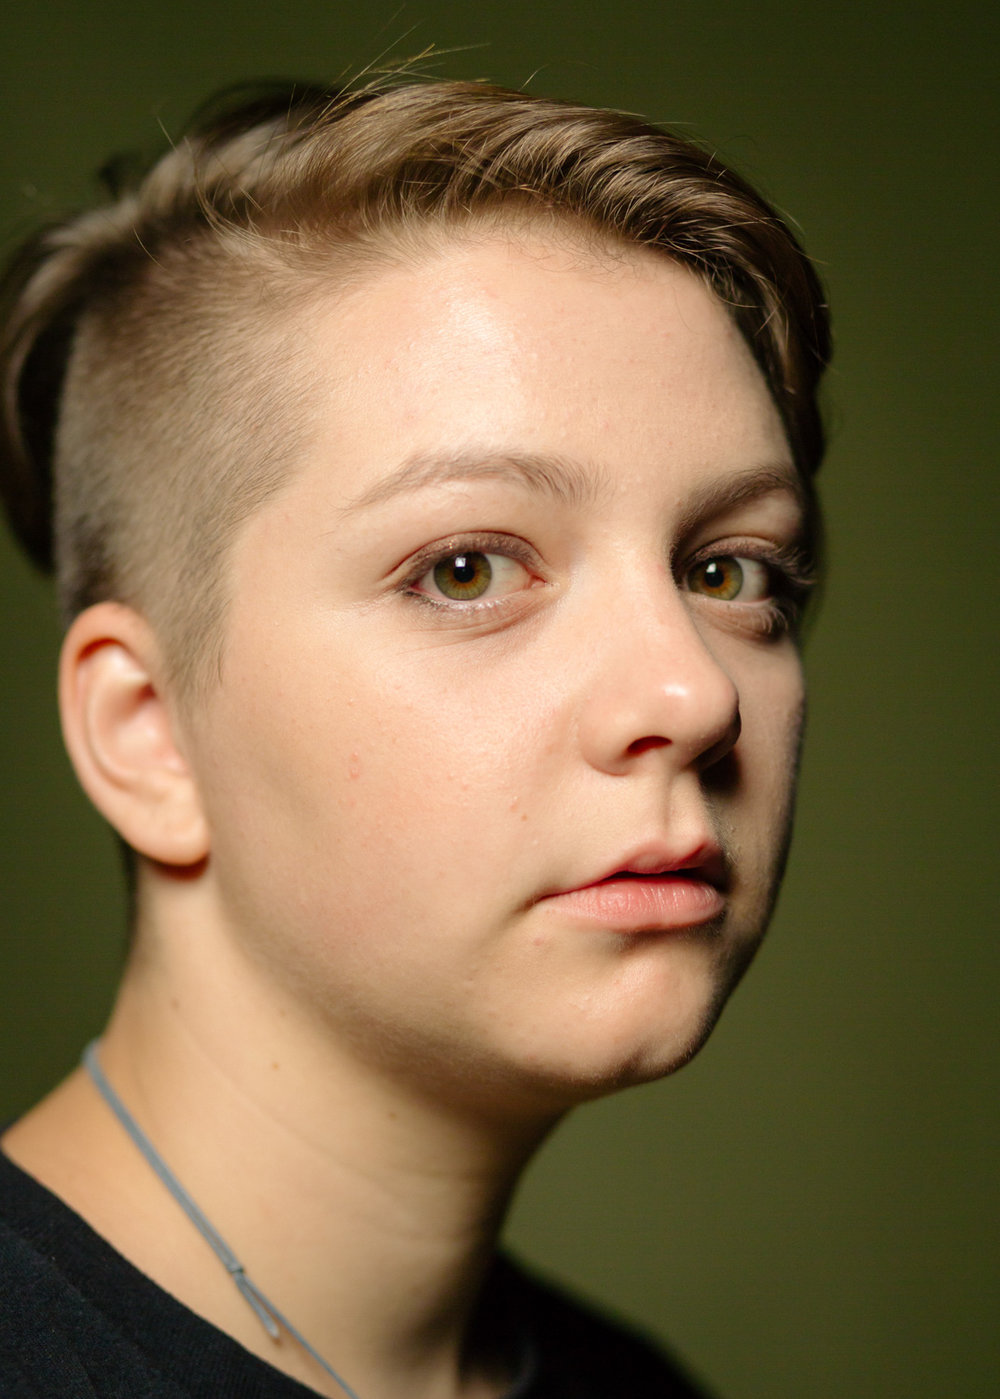 Pratt Student Portrait-2.jpg